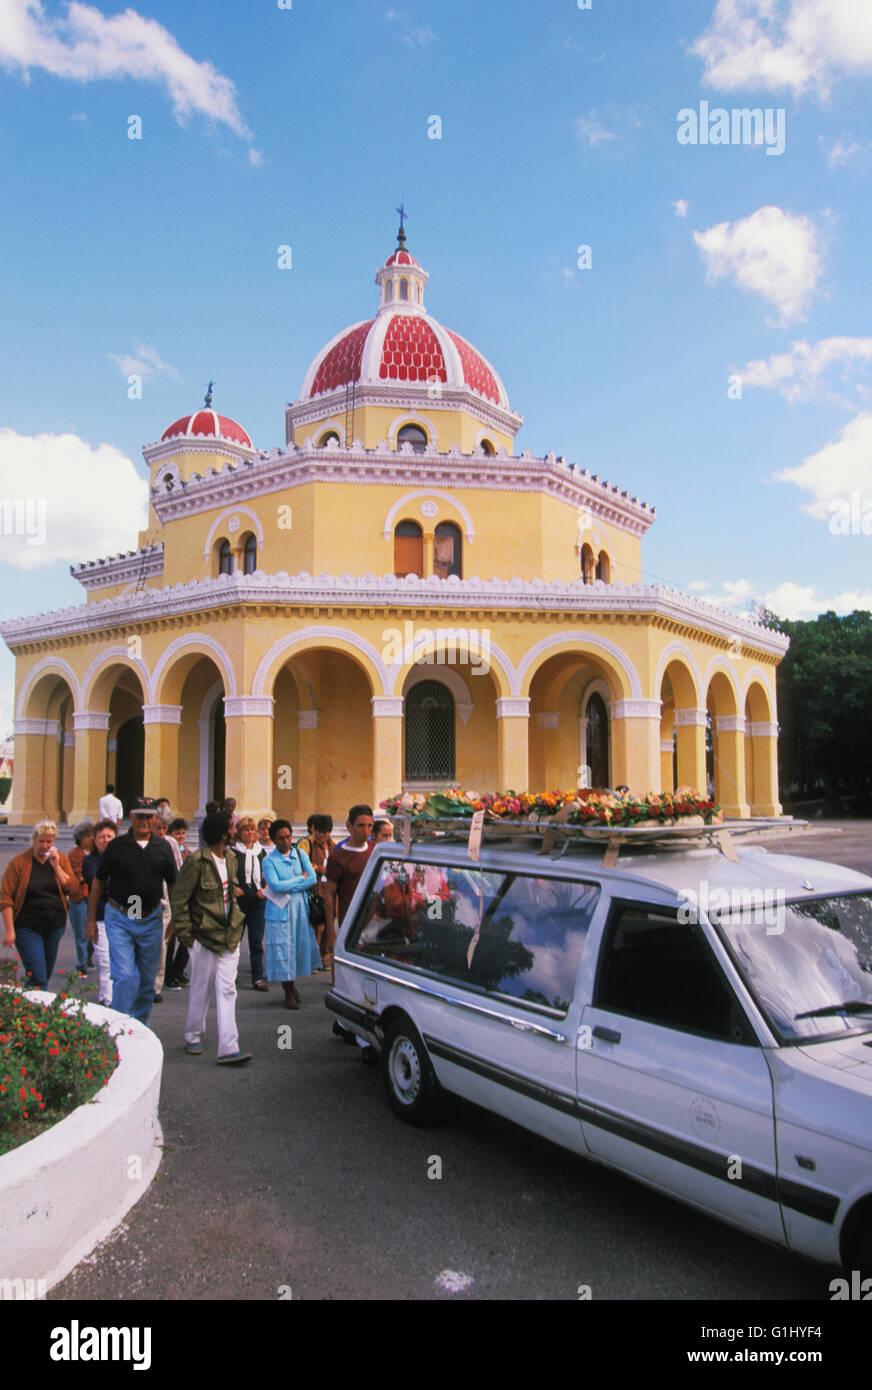 funeral procession in cemetery in Havana Cuba Caribbean - Stock Image